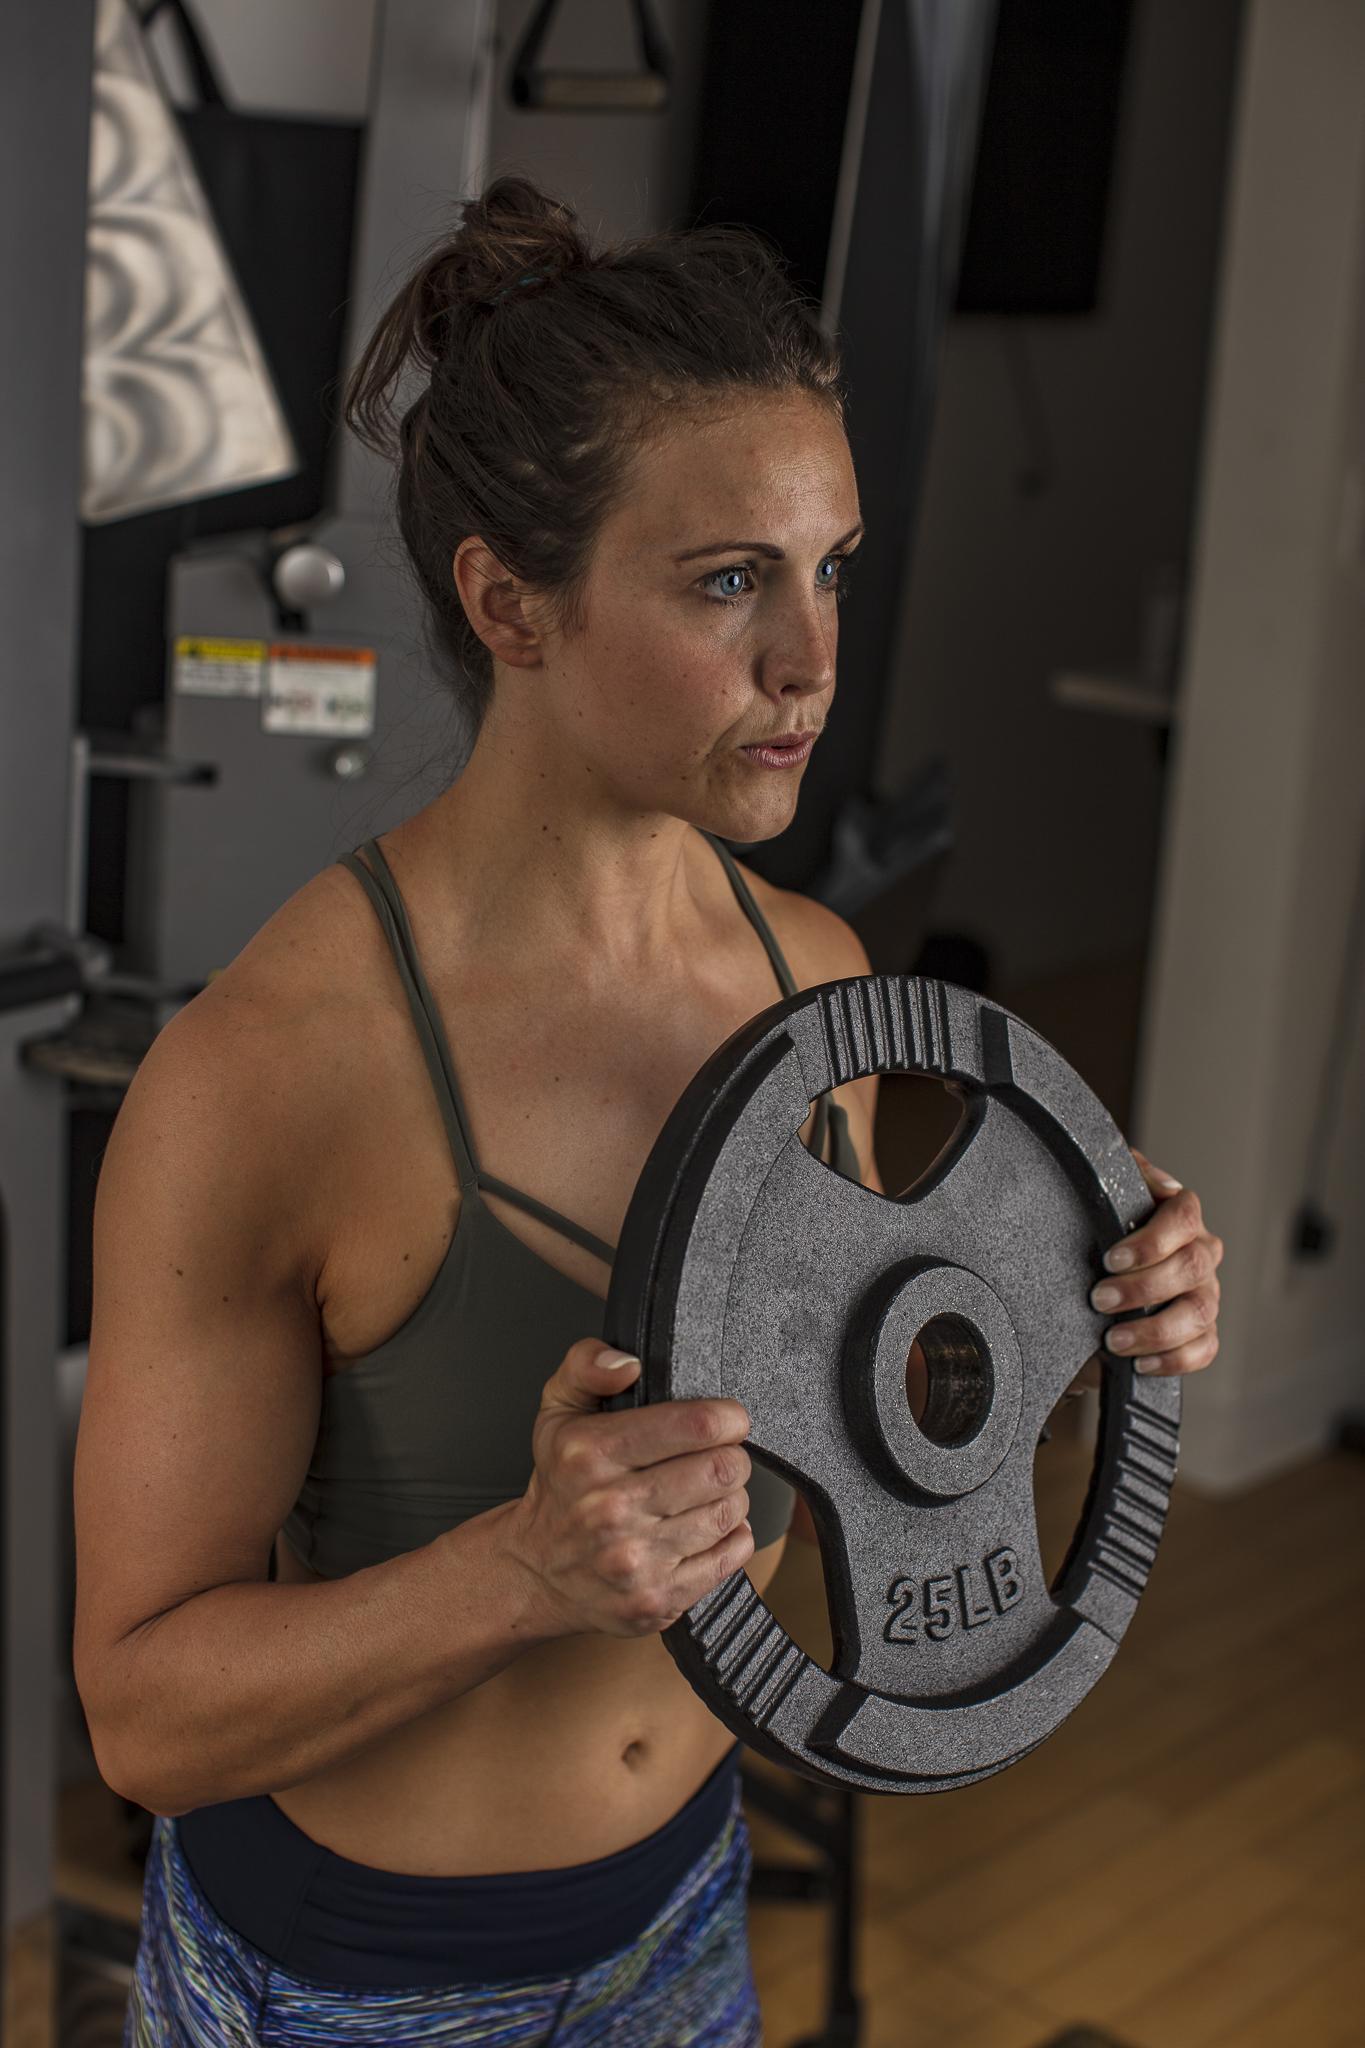 Sara Boyd - Fitness Coach - UvU Fitness - Reduced Edits - 09 Jun '19 - 03.JPG